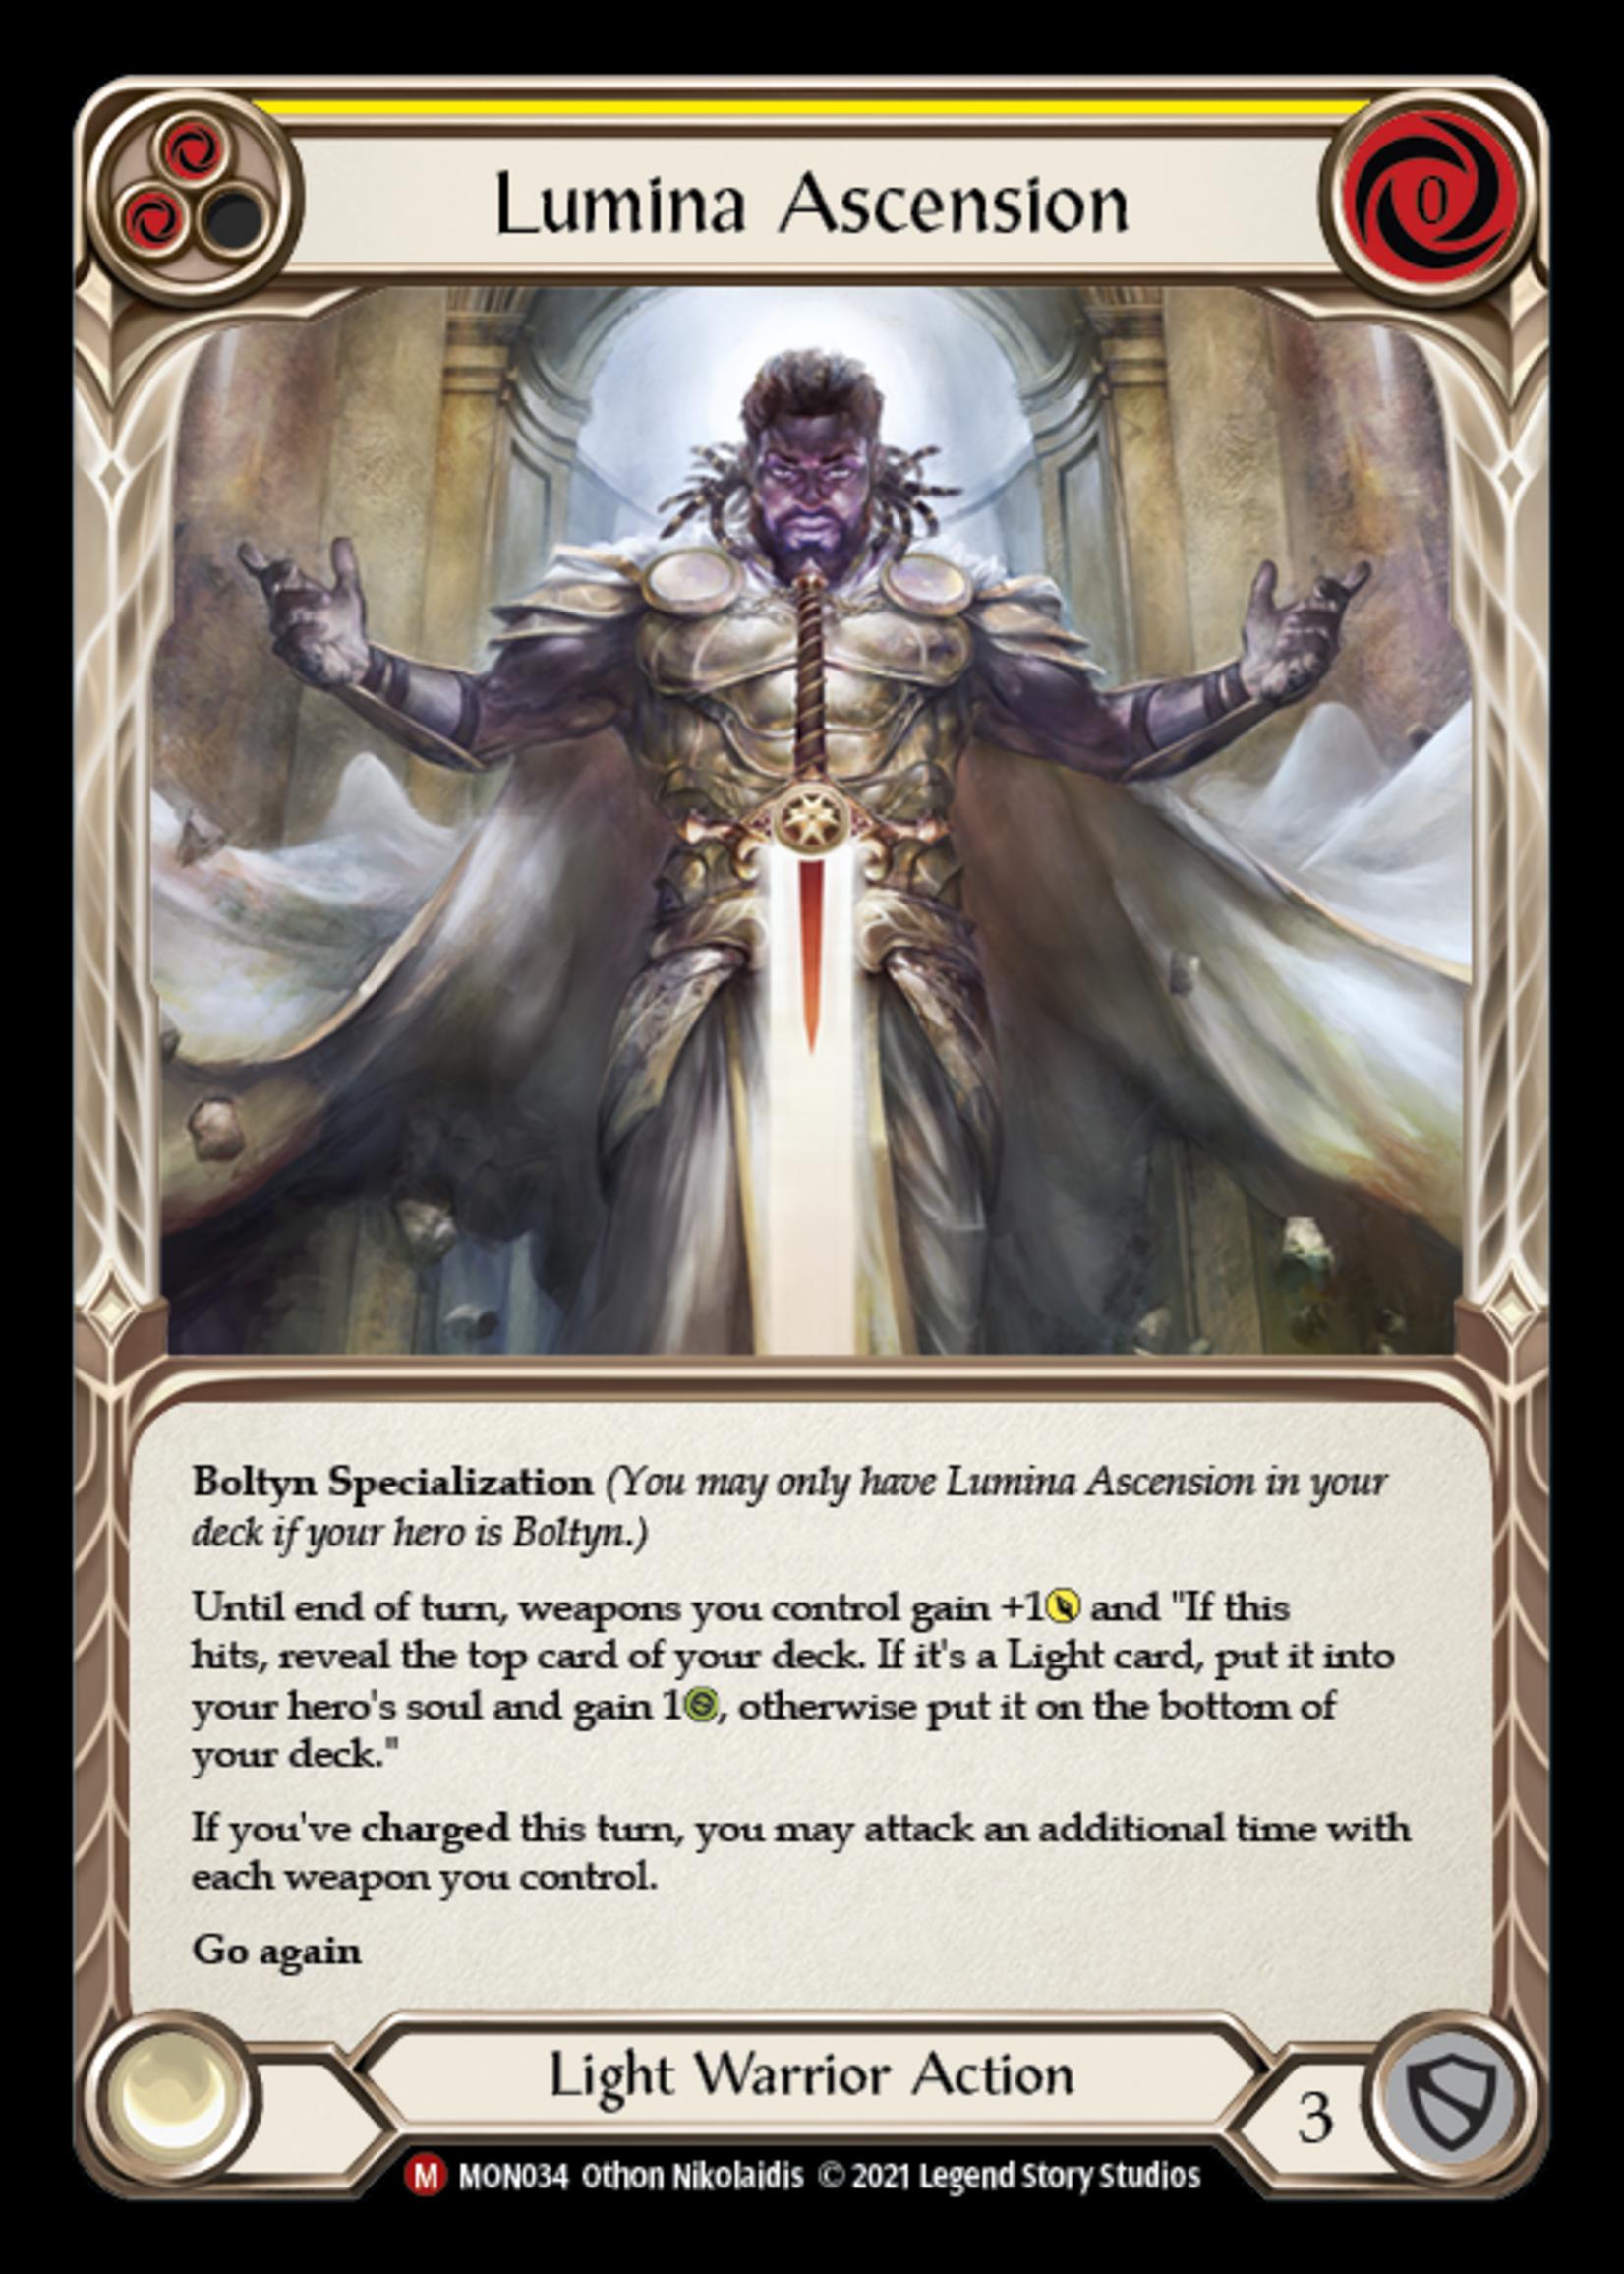 Flesh and Blood Lumina Ascension, MON034